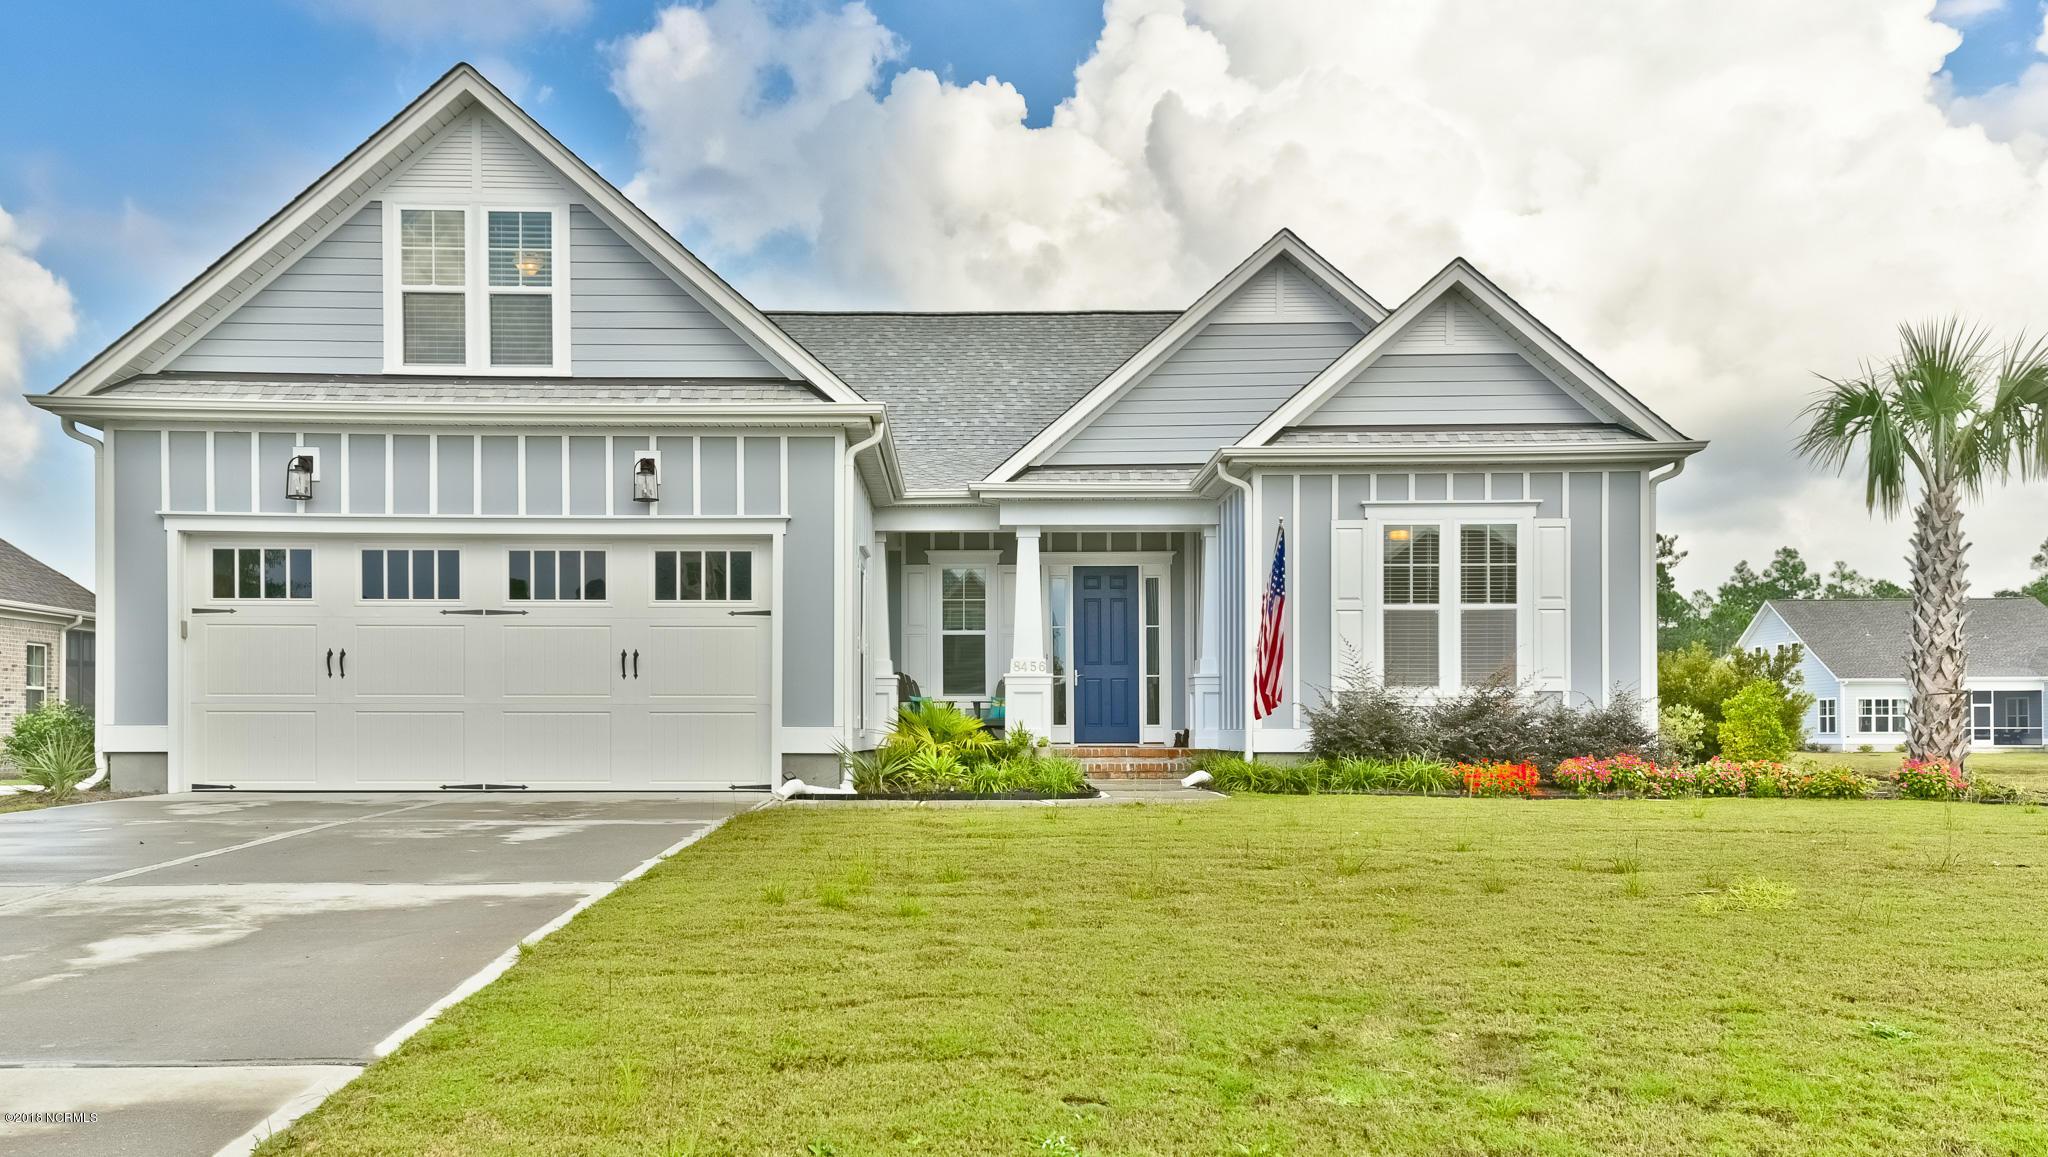 Carolina Plantations Real Estate - MLS Number: 100142121